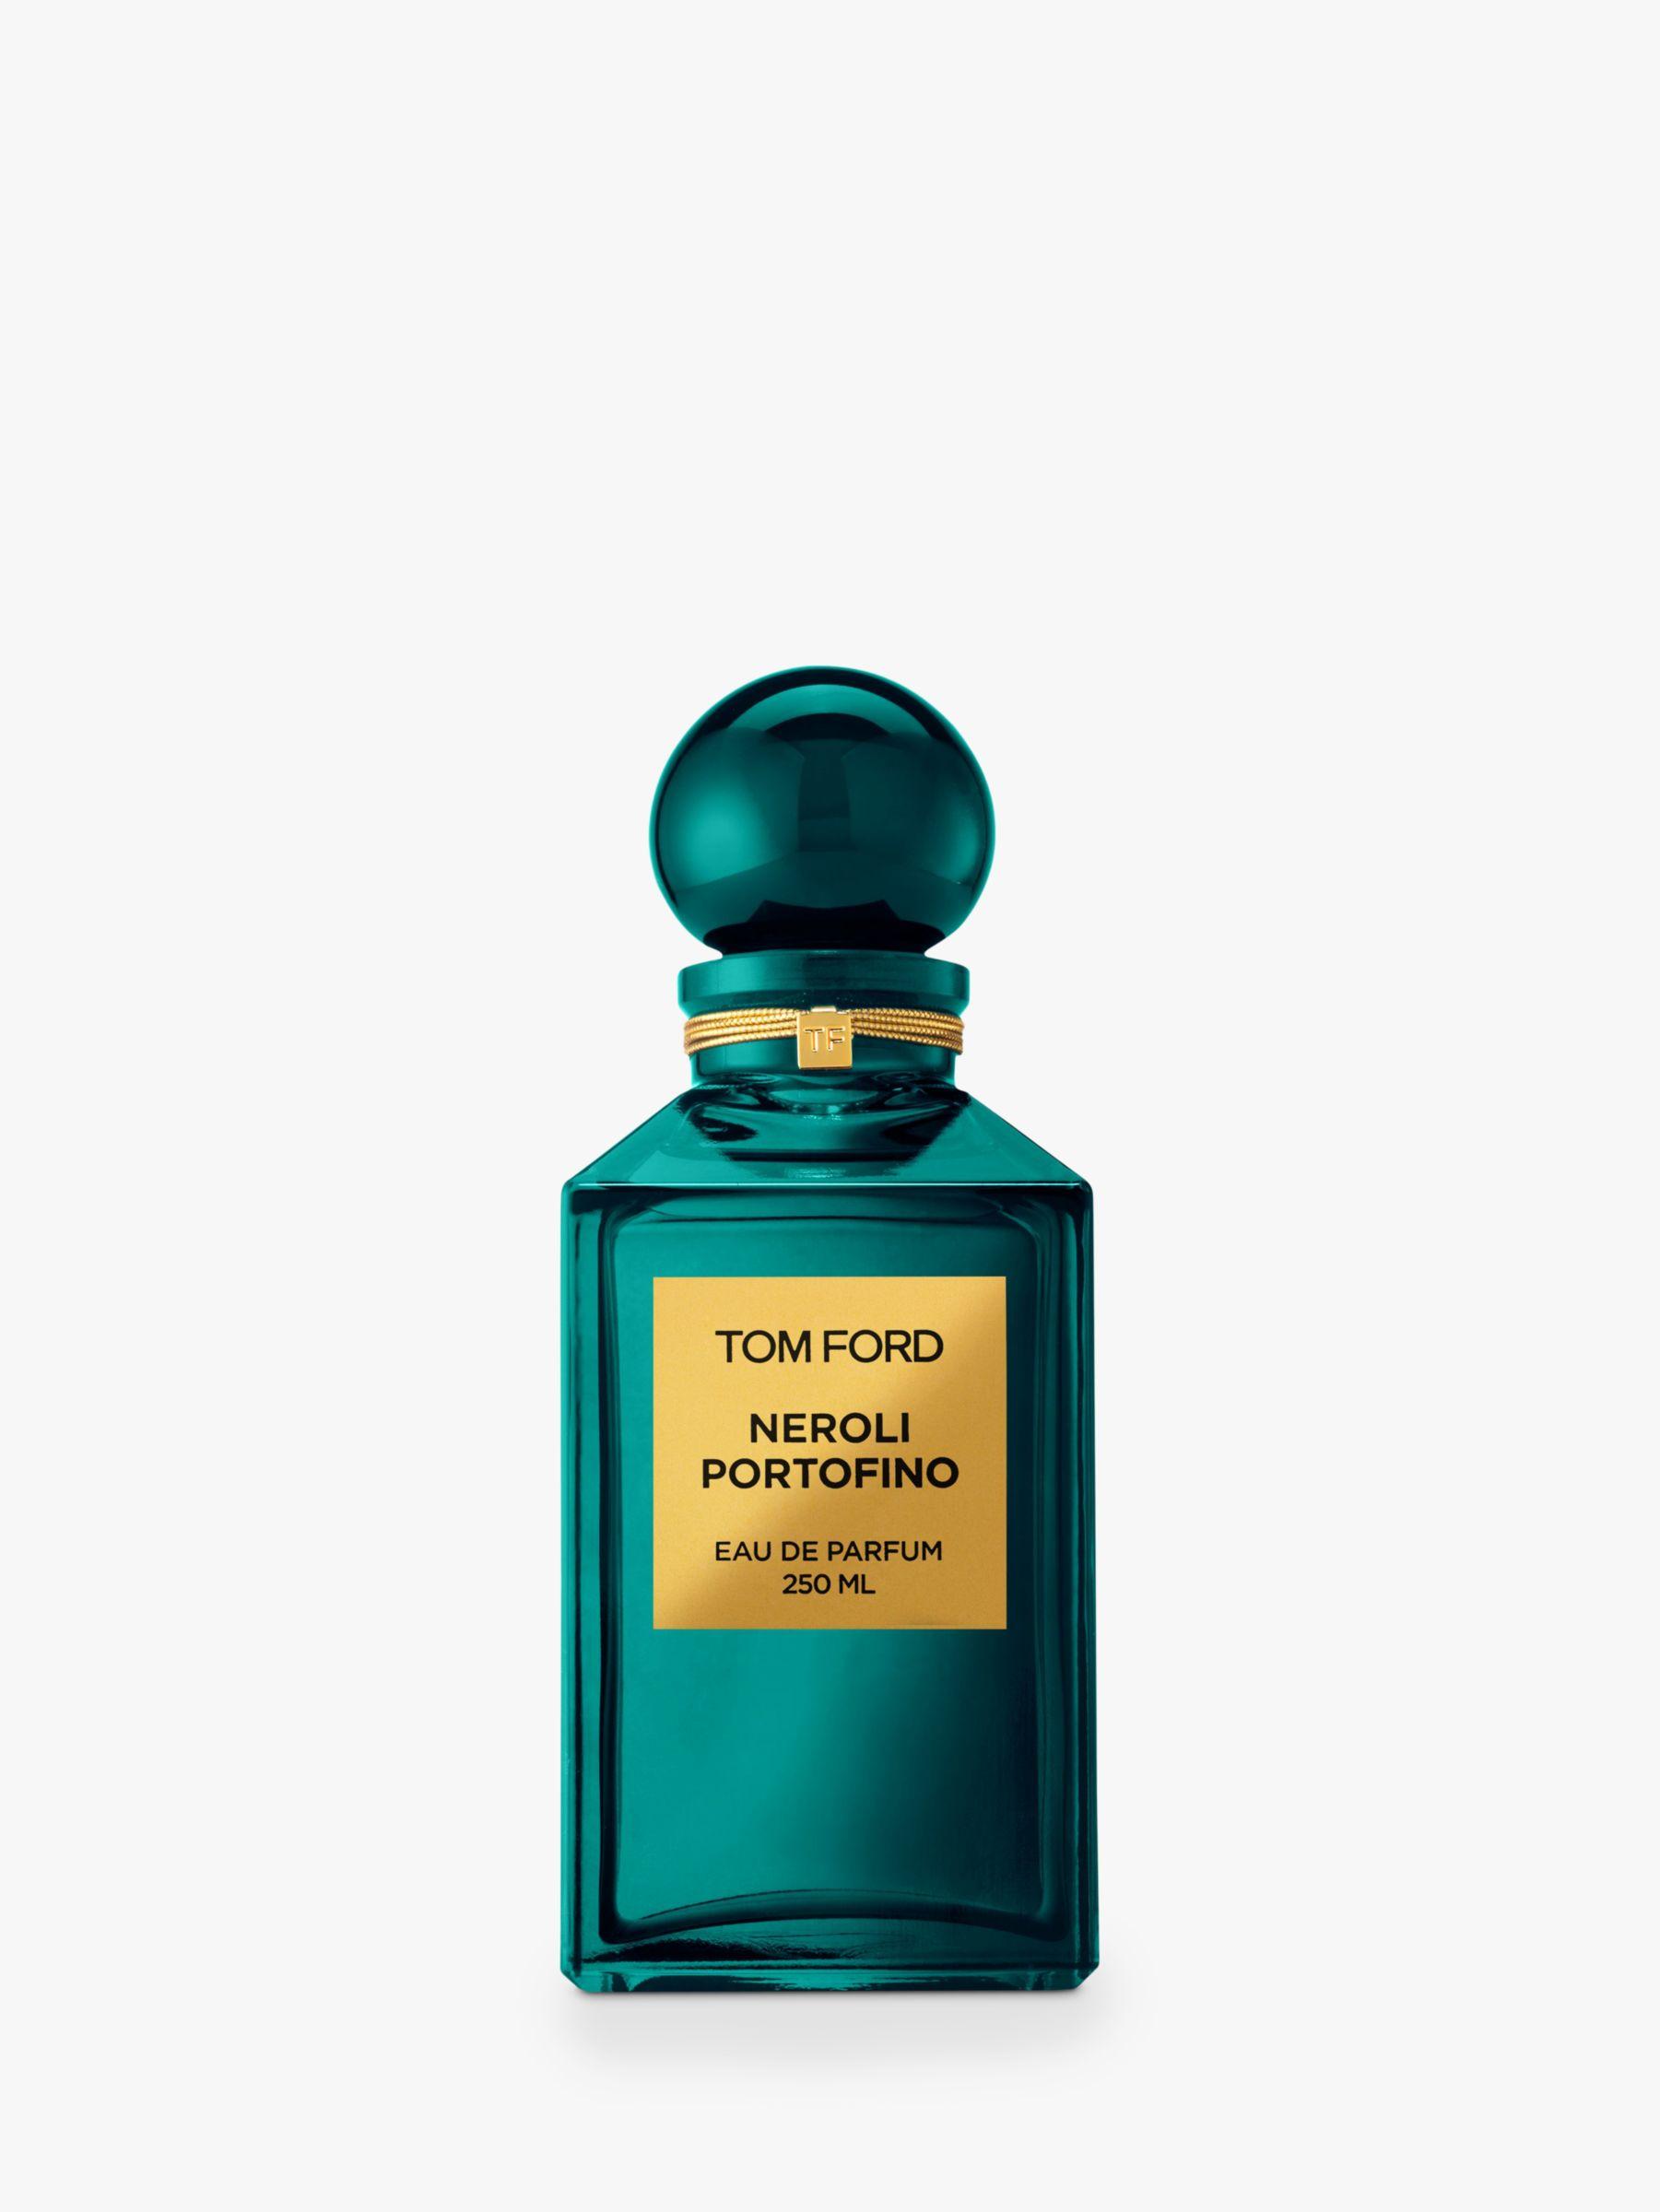 TOM FORD NEROLI PORTOFINO Eau de Parfum 250ml